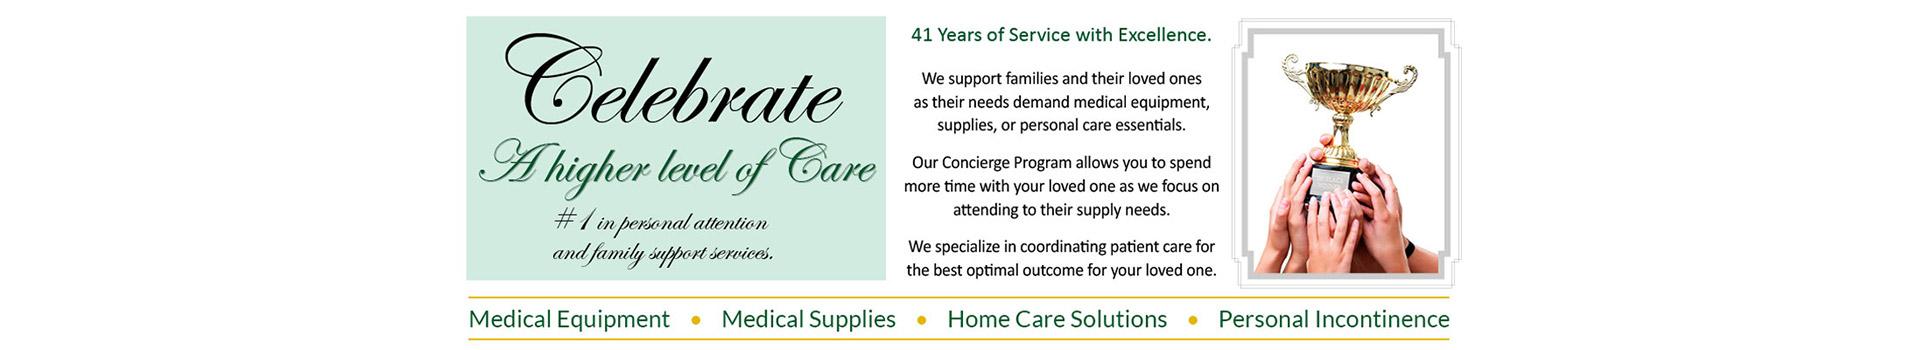 Celebrate-a-Higher-Level-of-Care